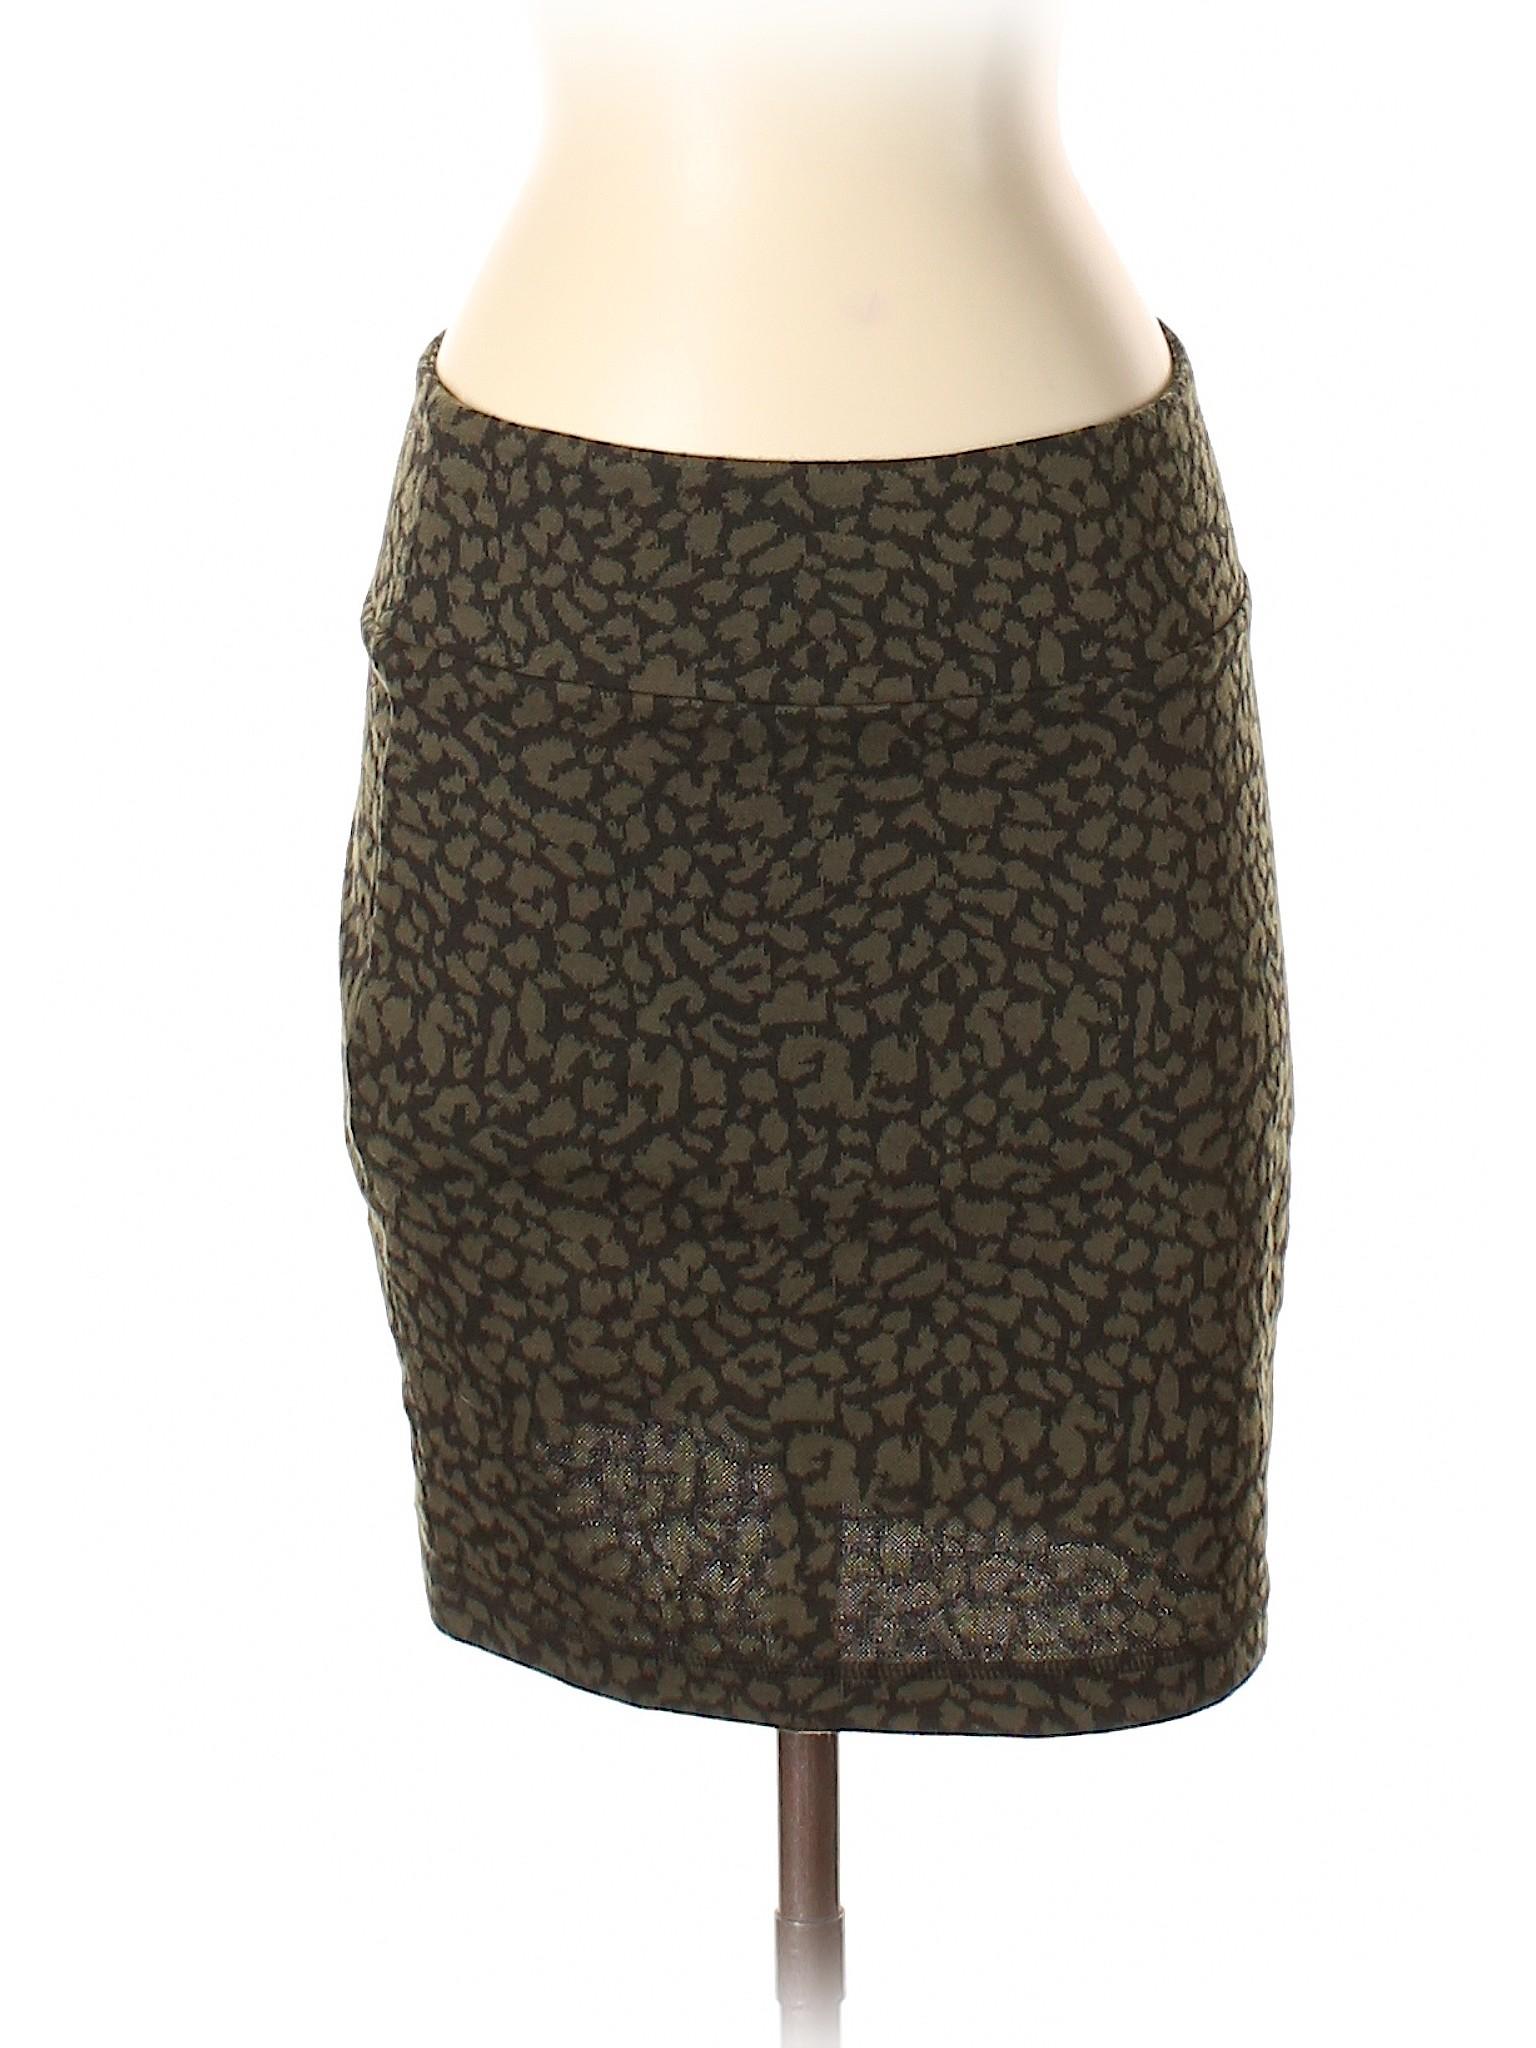 Casual Boutique Casual Boutique Skirt Skirt Boutique Casual Skirt SYq8PSw